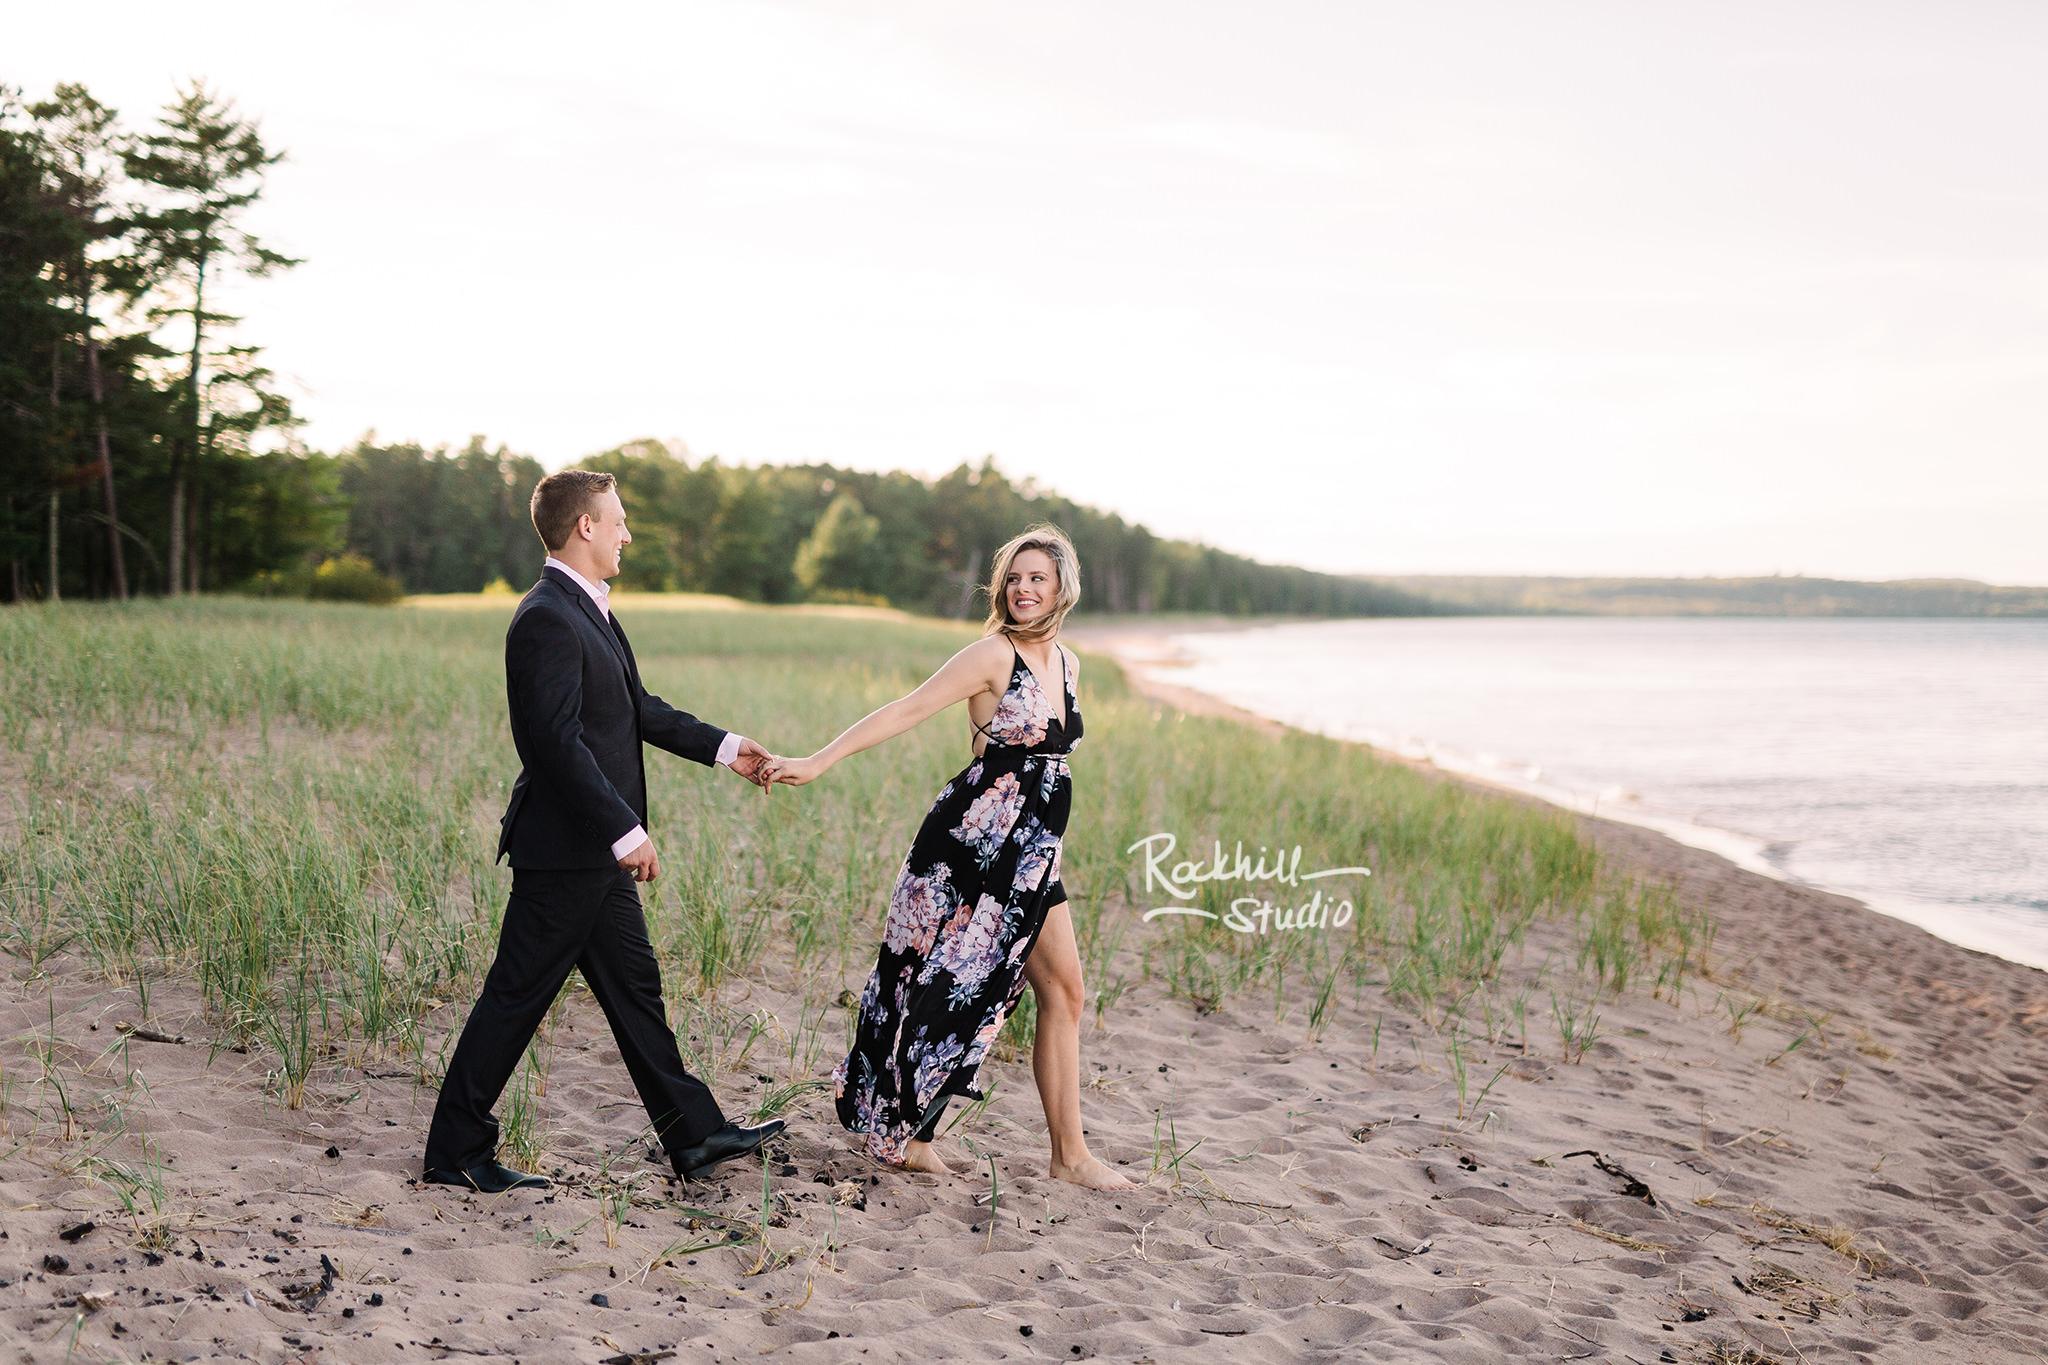 Traverse City Michigan Wedding Photography Rockhill Studio